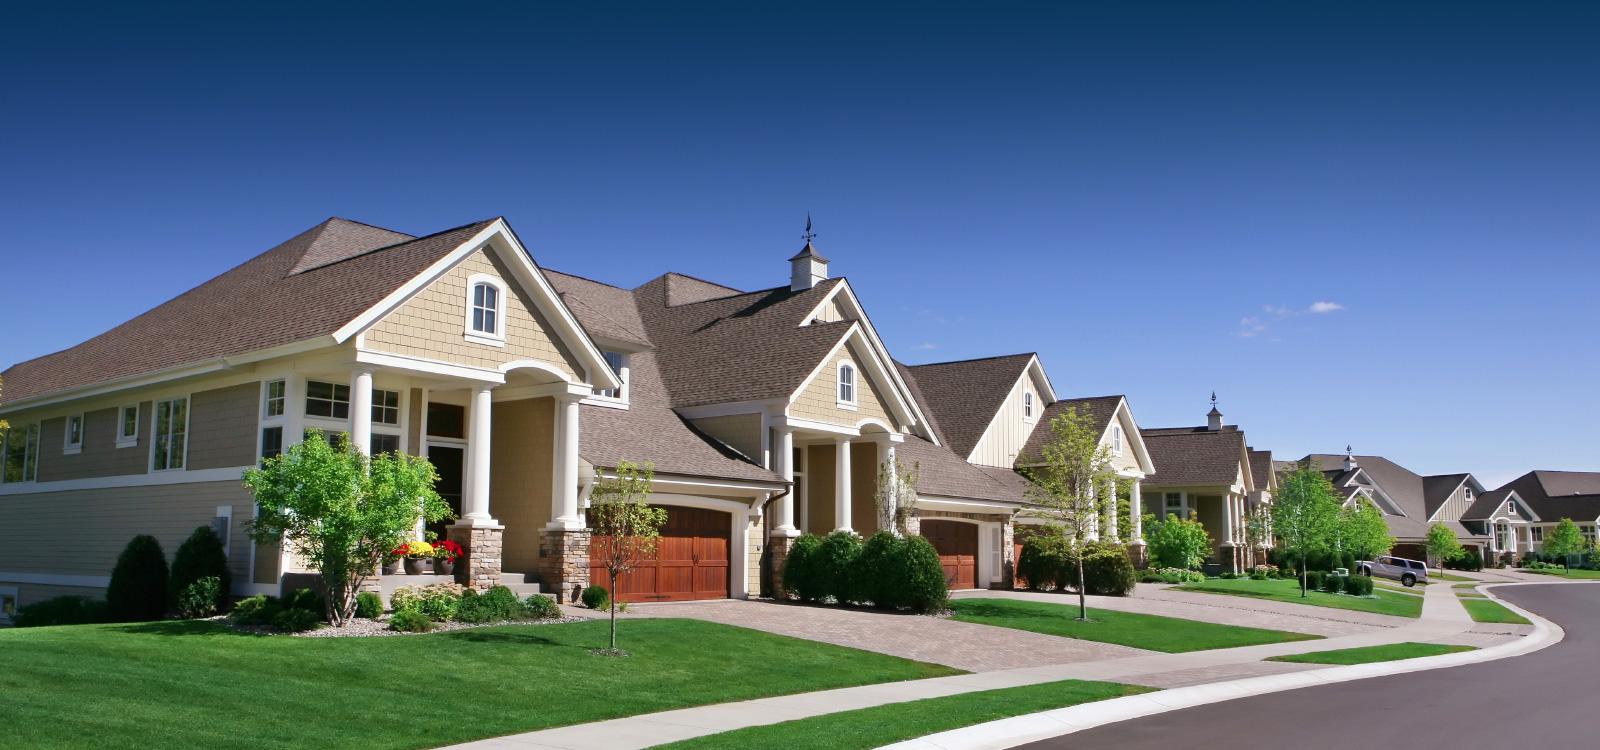 Home Inspection Checklist Billings